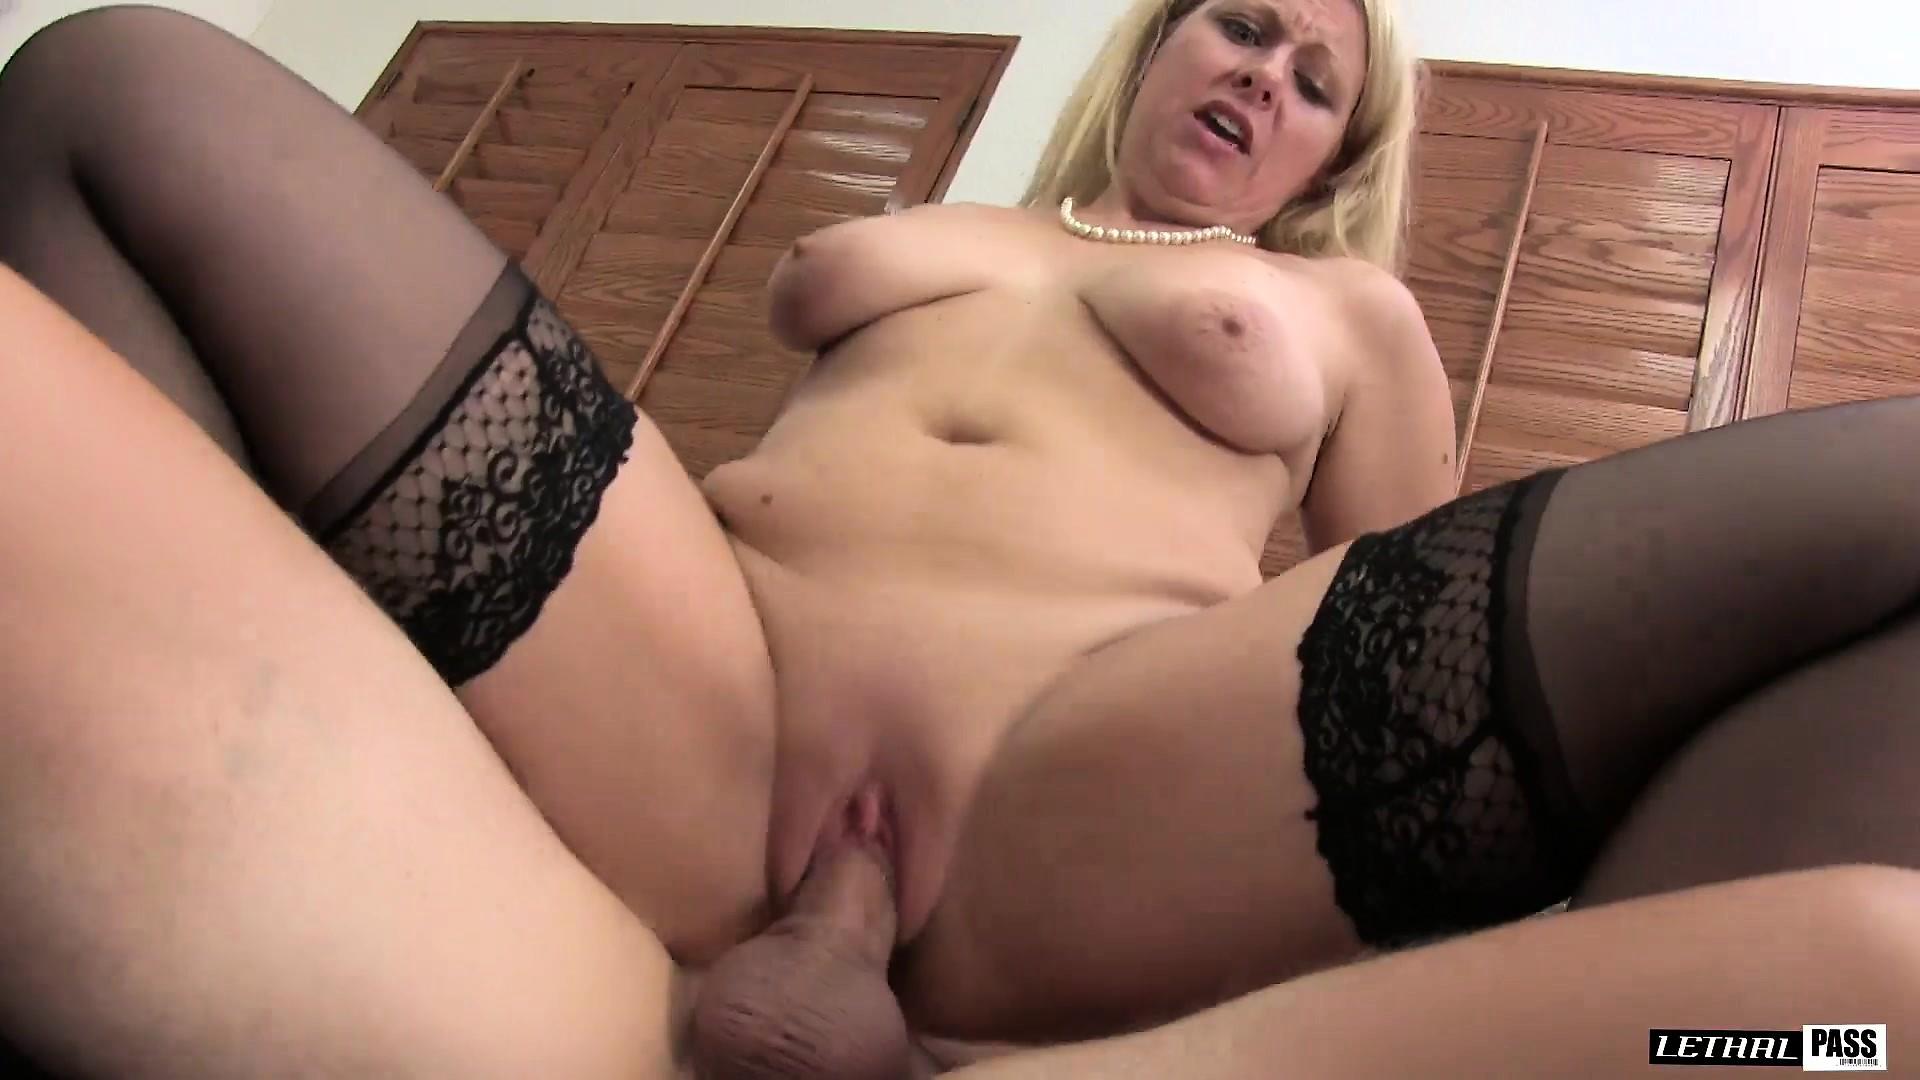 Busty mature amateur dildo masturbation